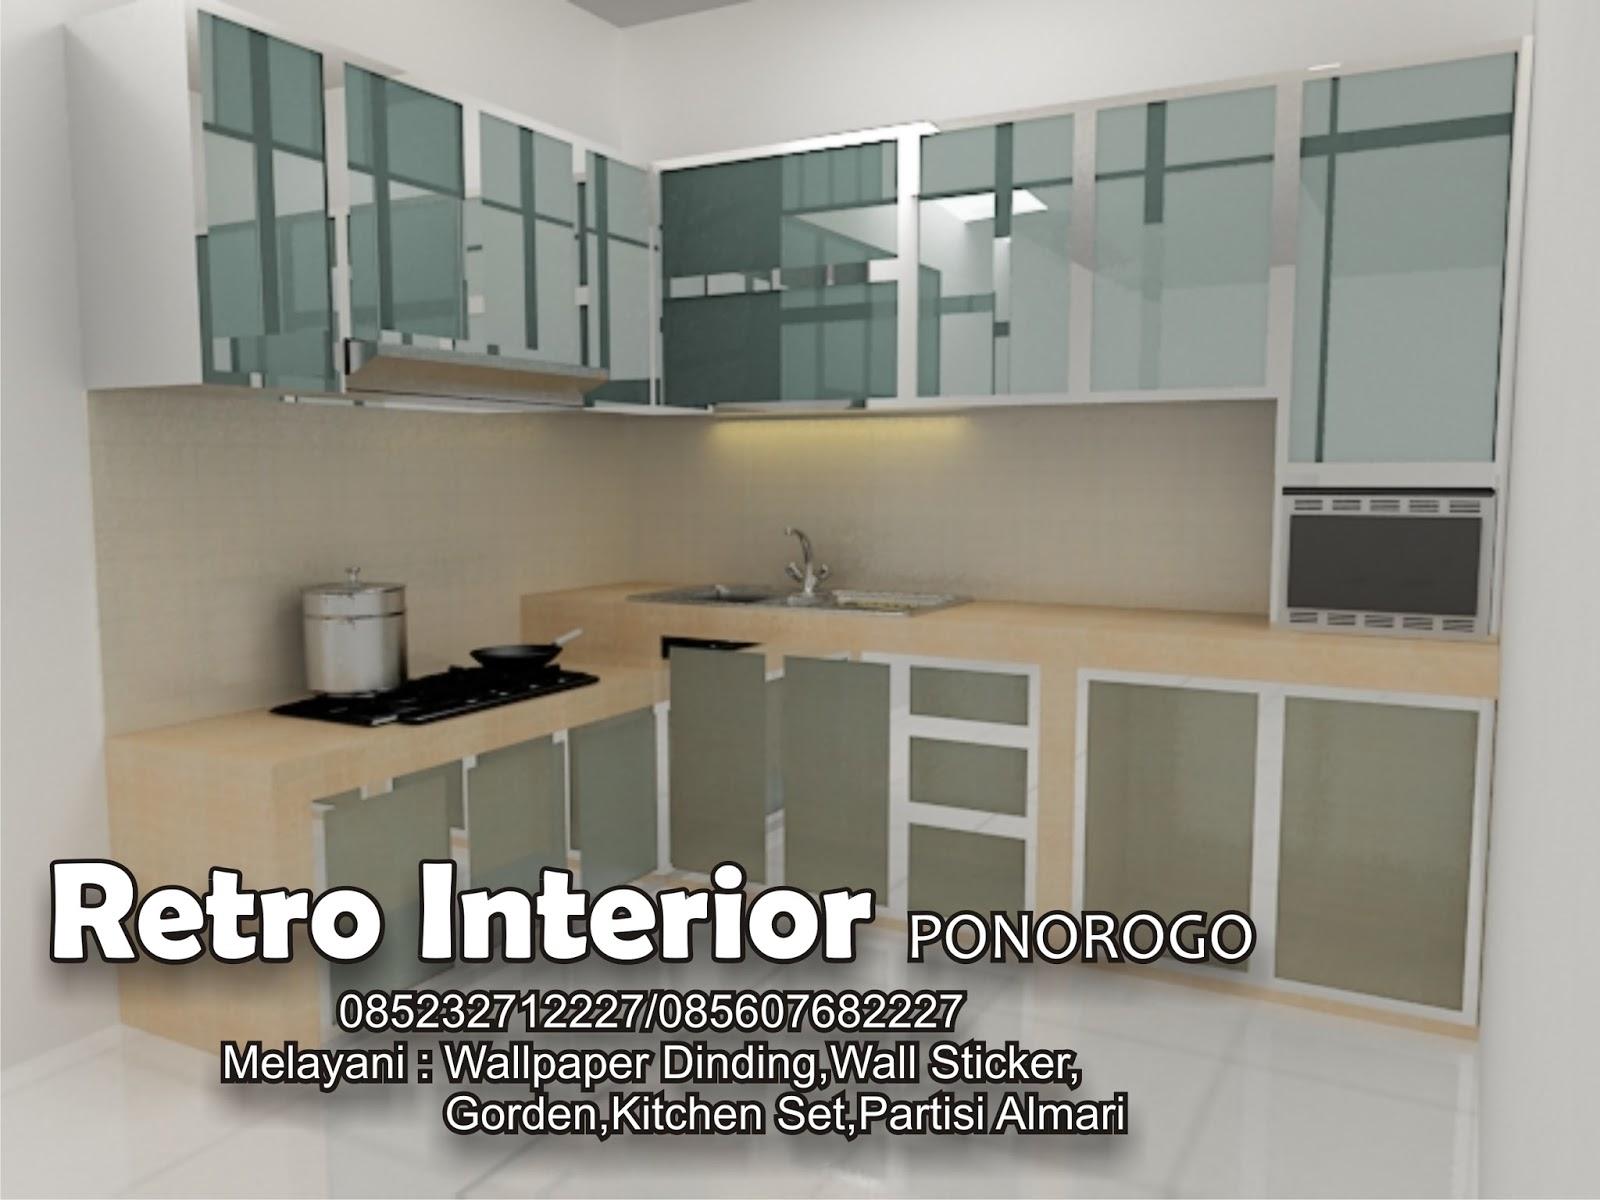 Kitchen Set Ponorogo 085607682227 085232712227 Pin Bb 5ad0821b